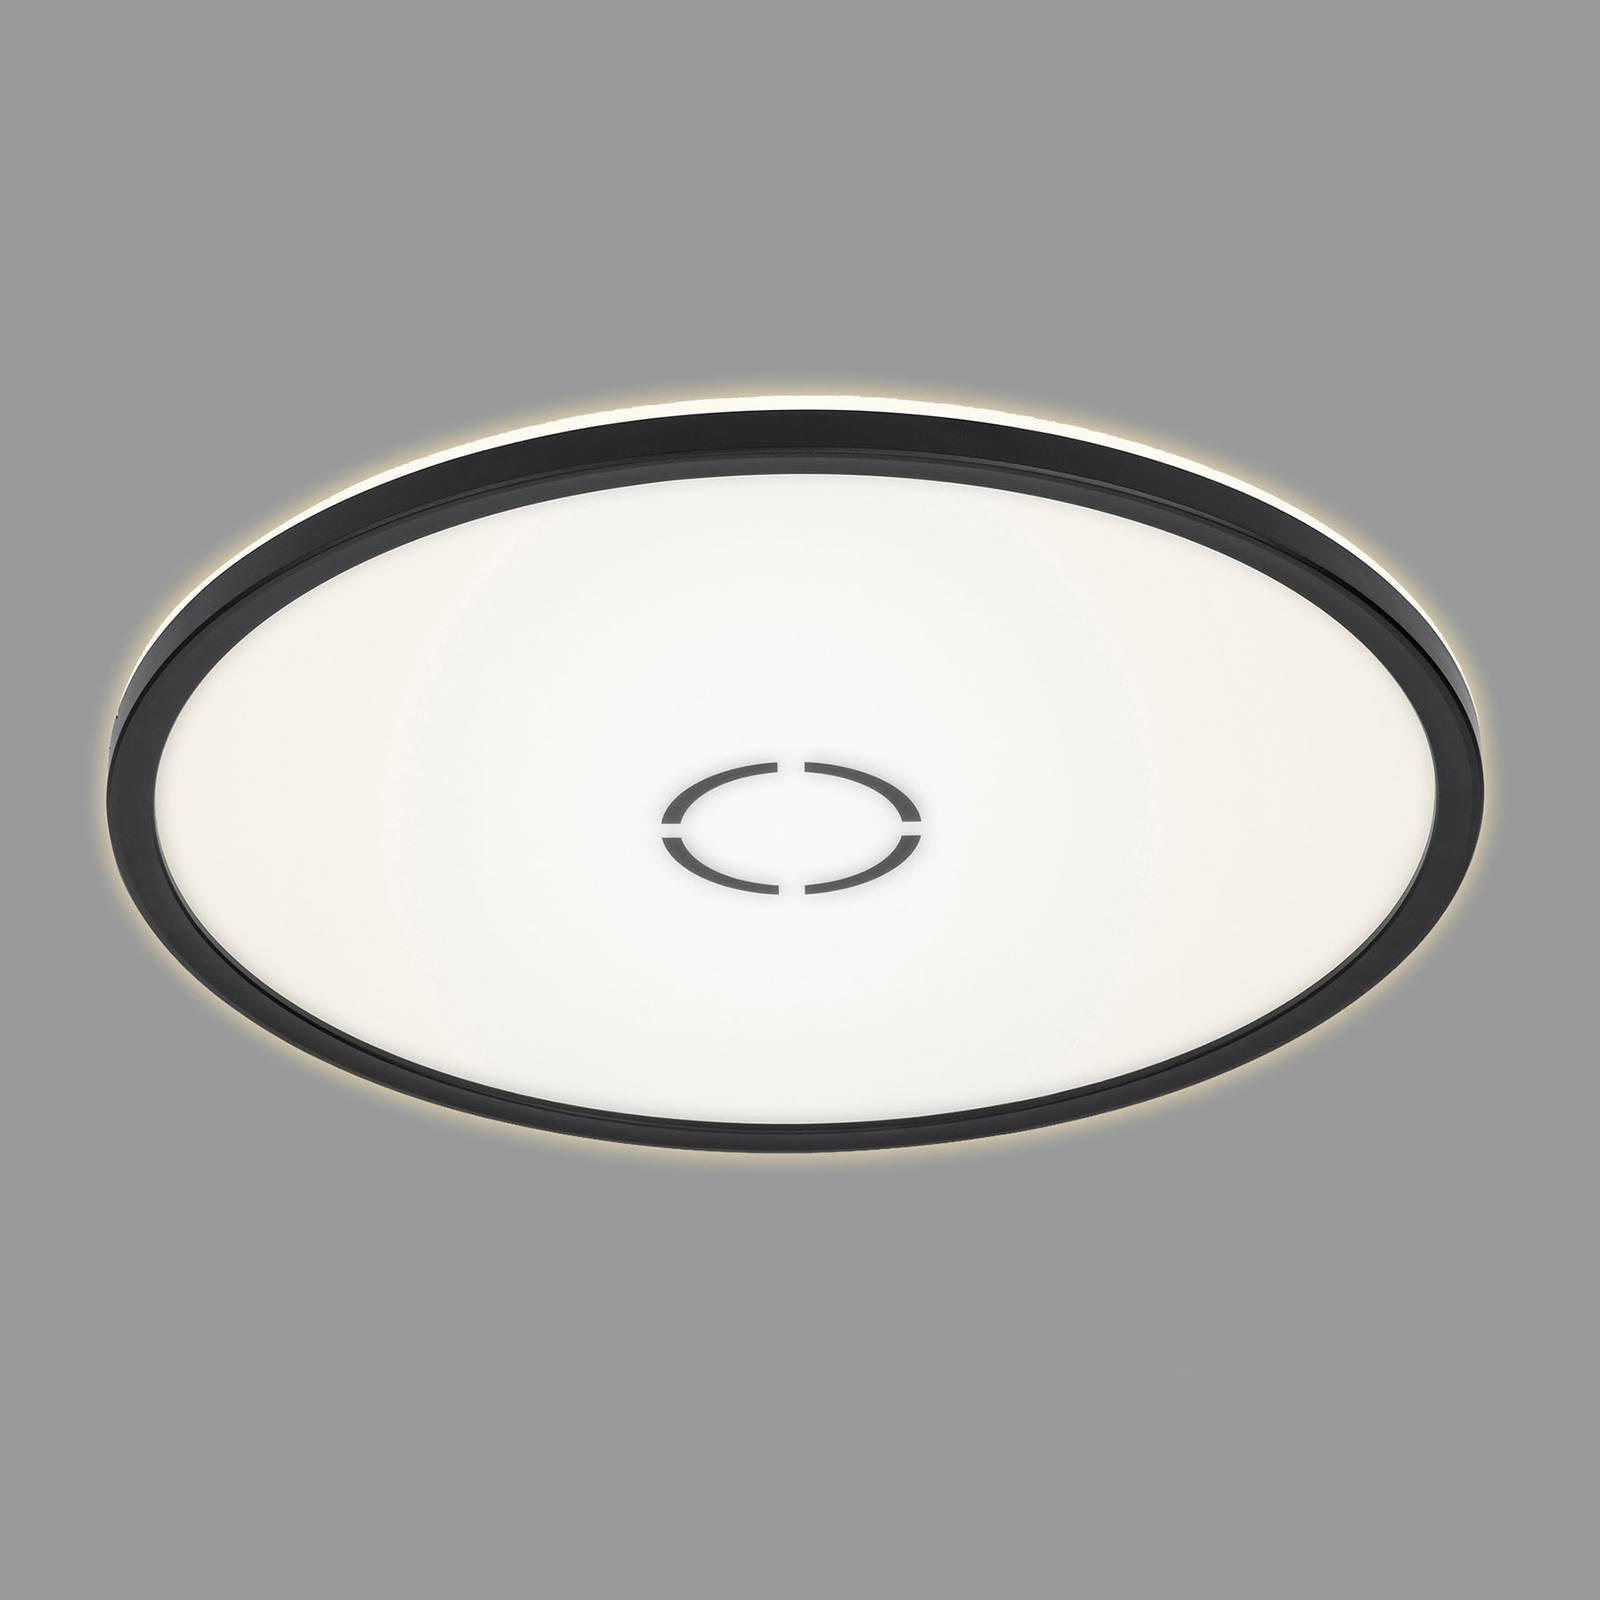 LED-taklampe Free Ø 42 cm svart